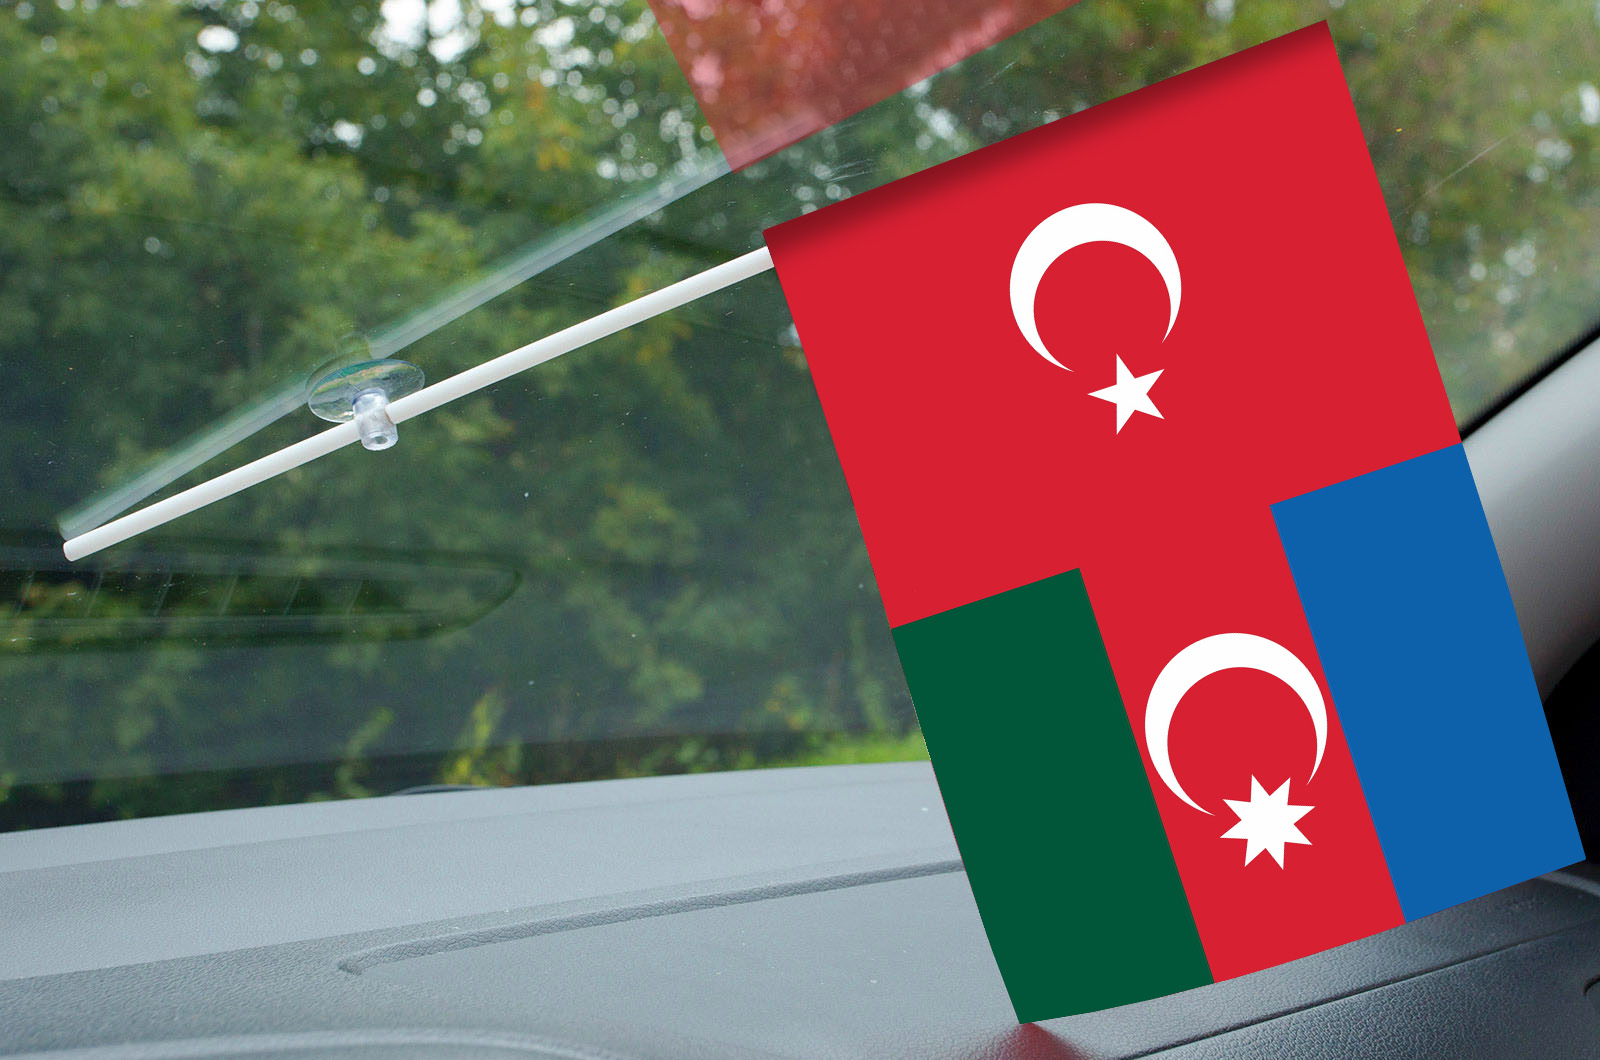 Маленький турецкий флажок на палочке